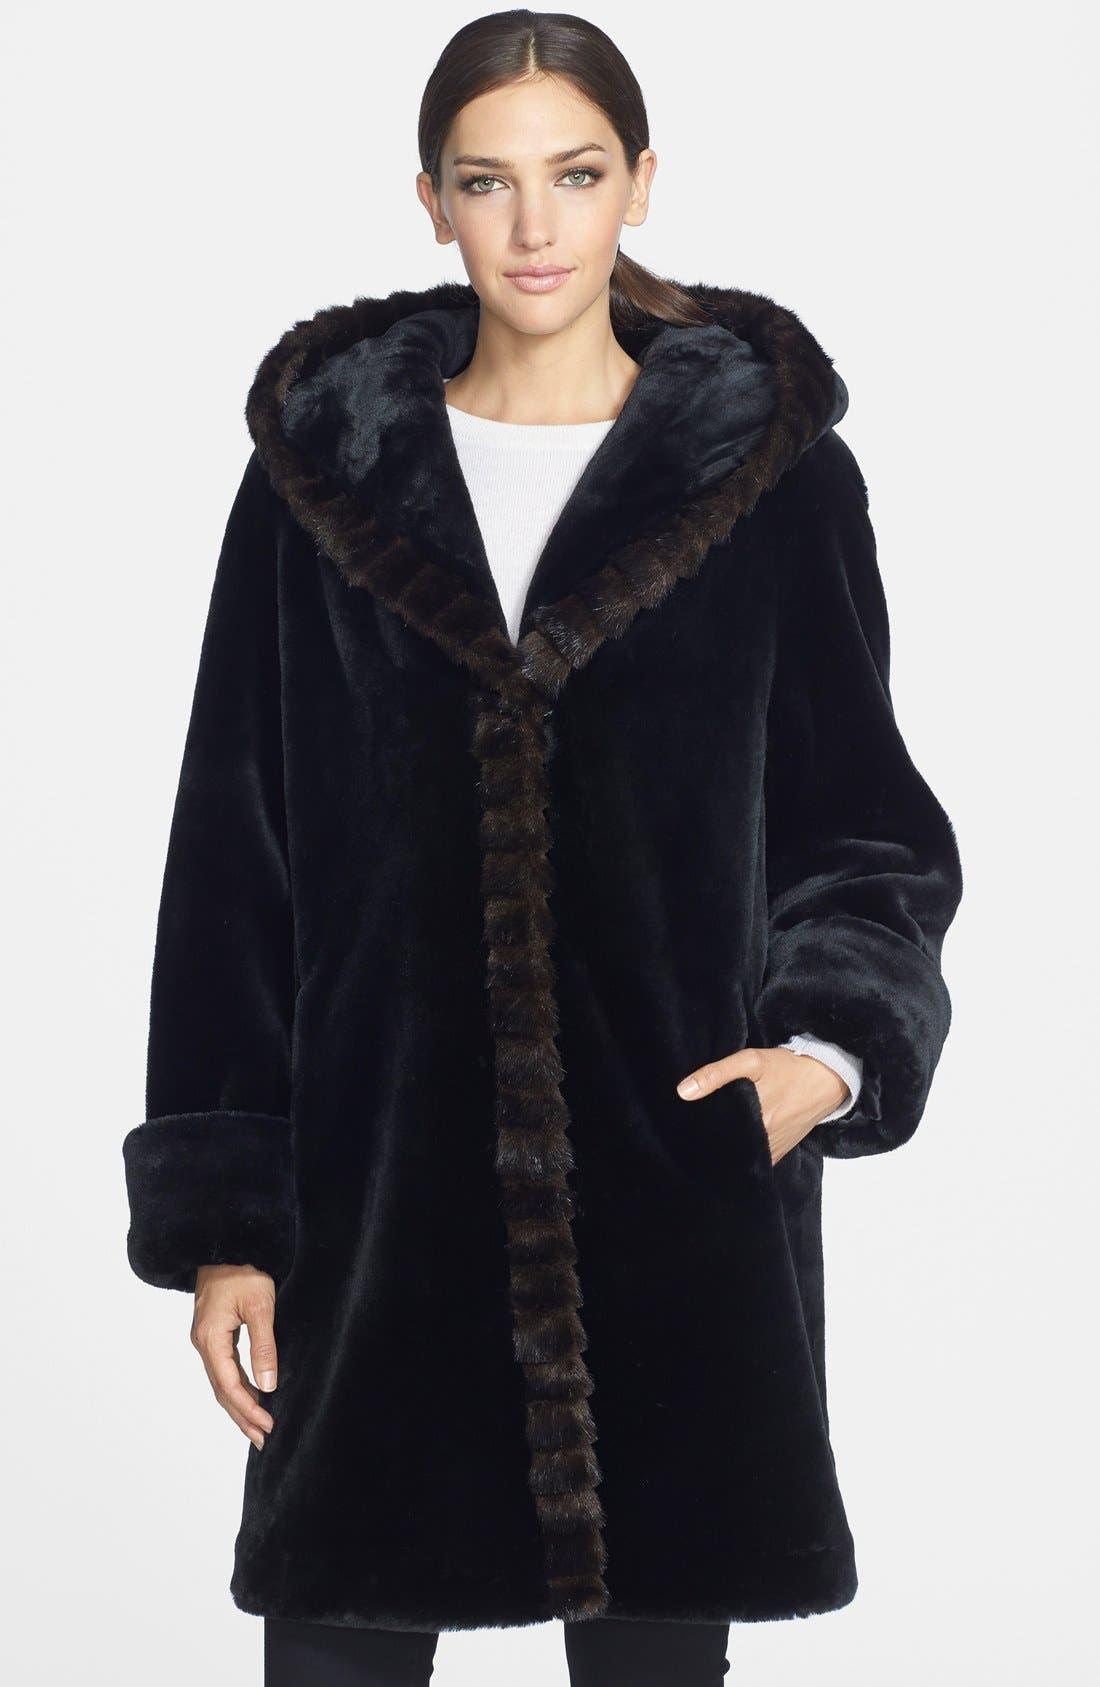 Gallery Hooded Faux Fur Walking Coat (Online Only)